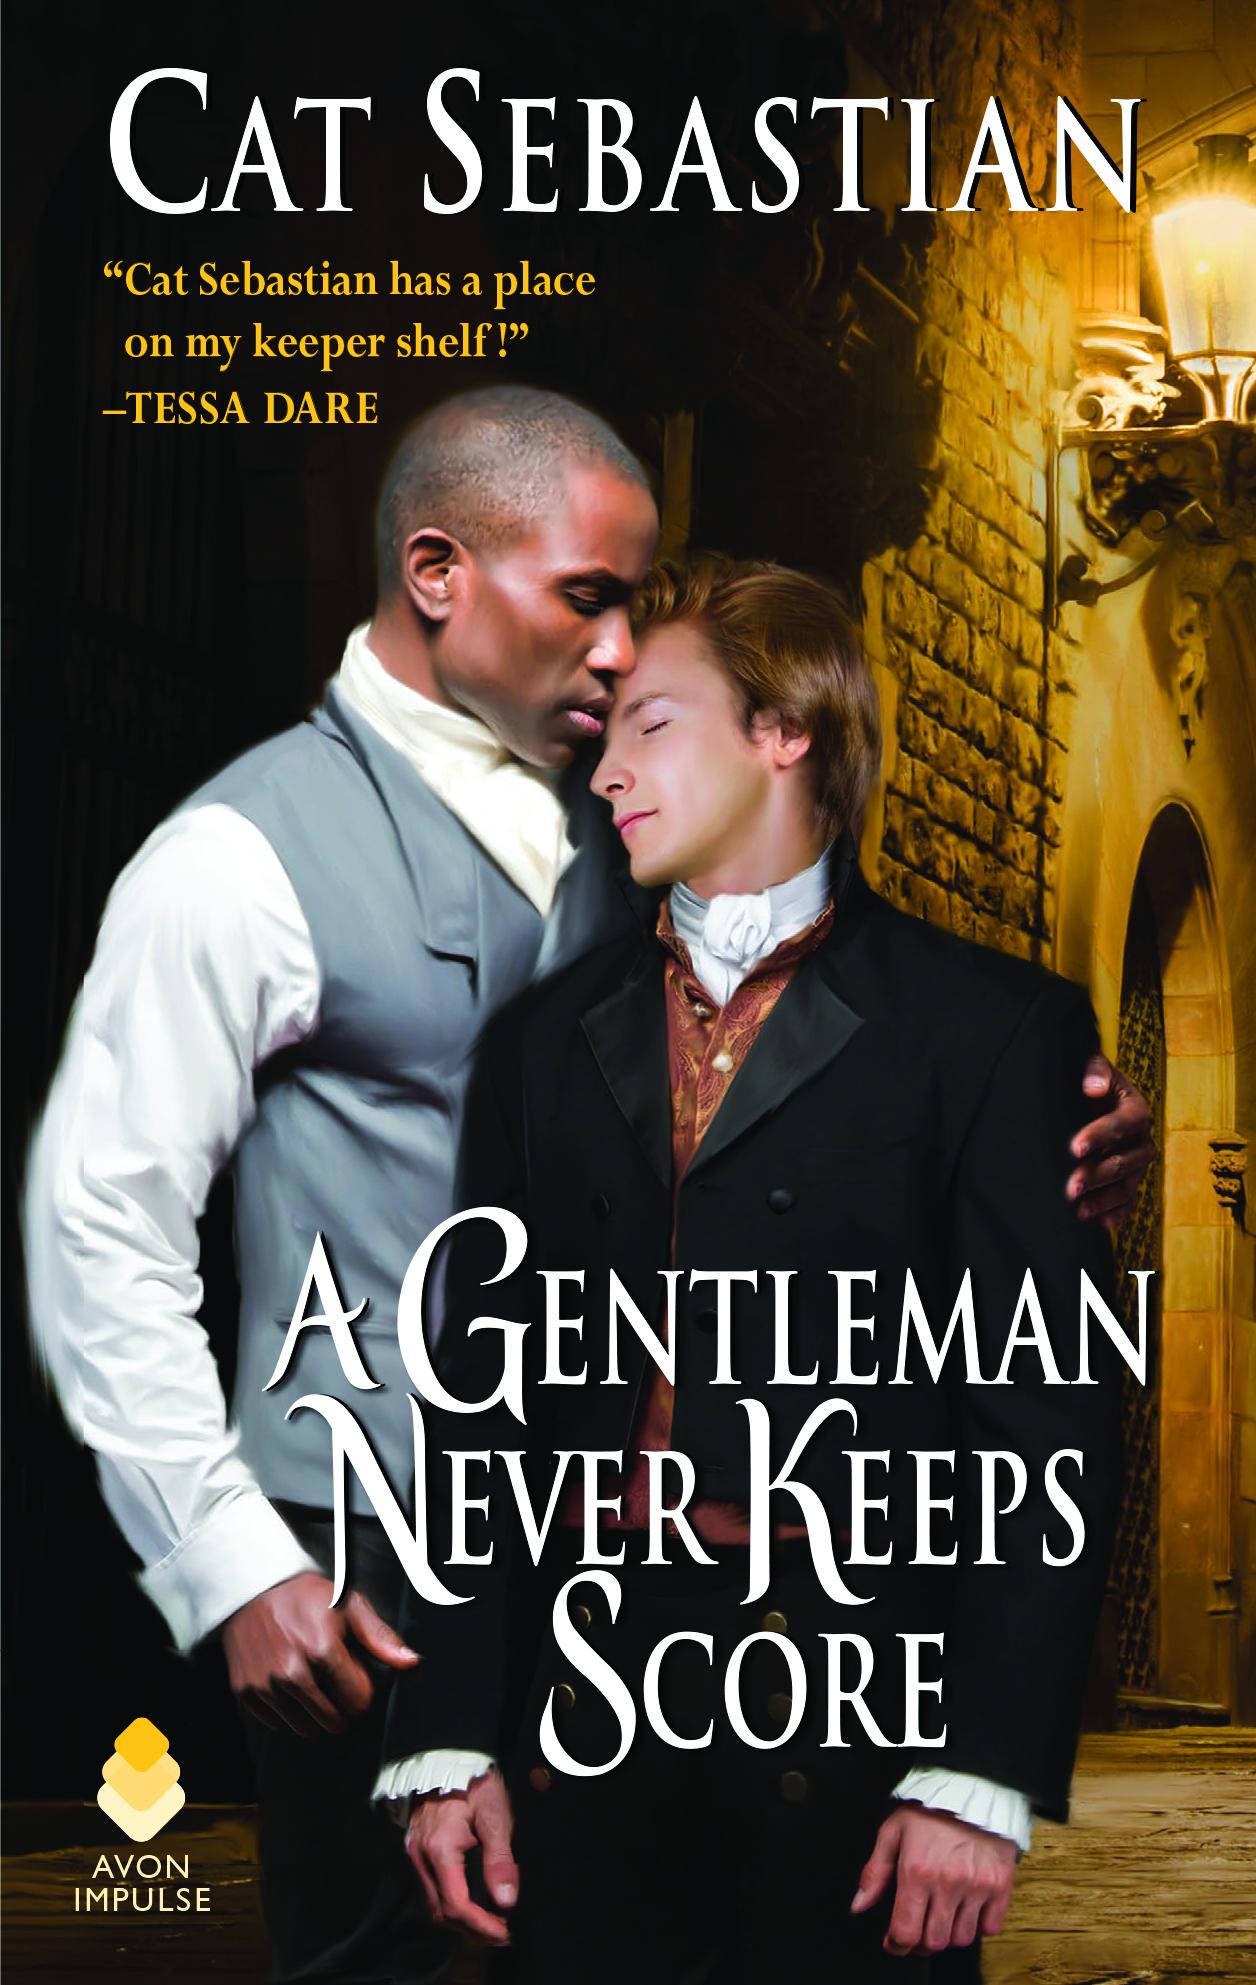 Excerpt: A Gentleman Never Keeps Score by Cat Sebastian